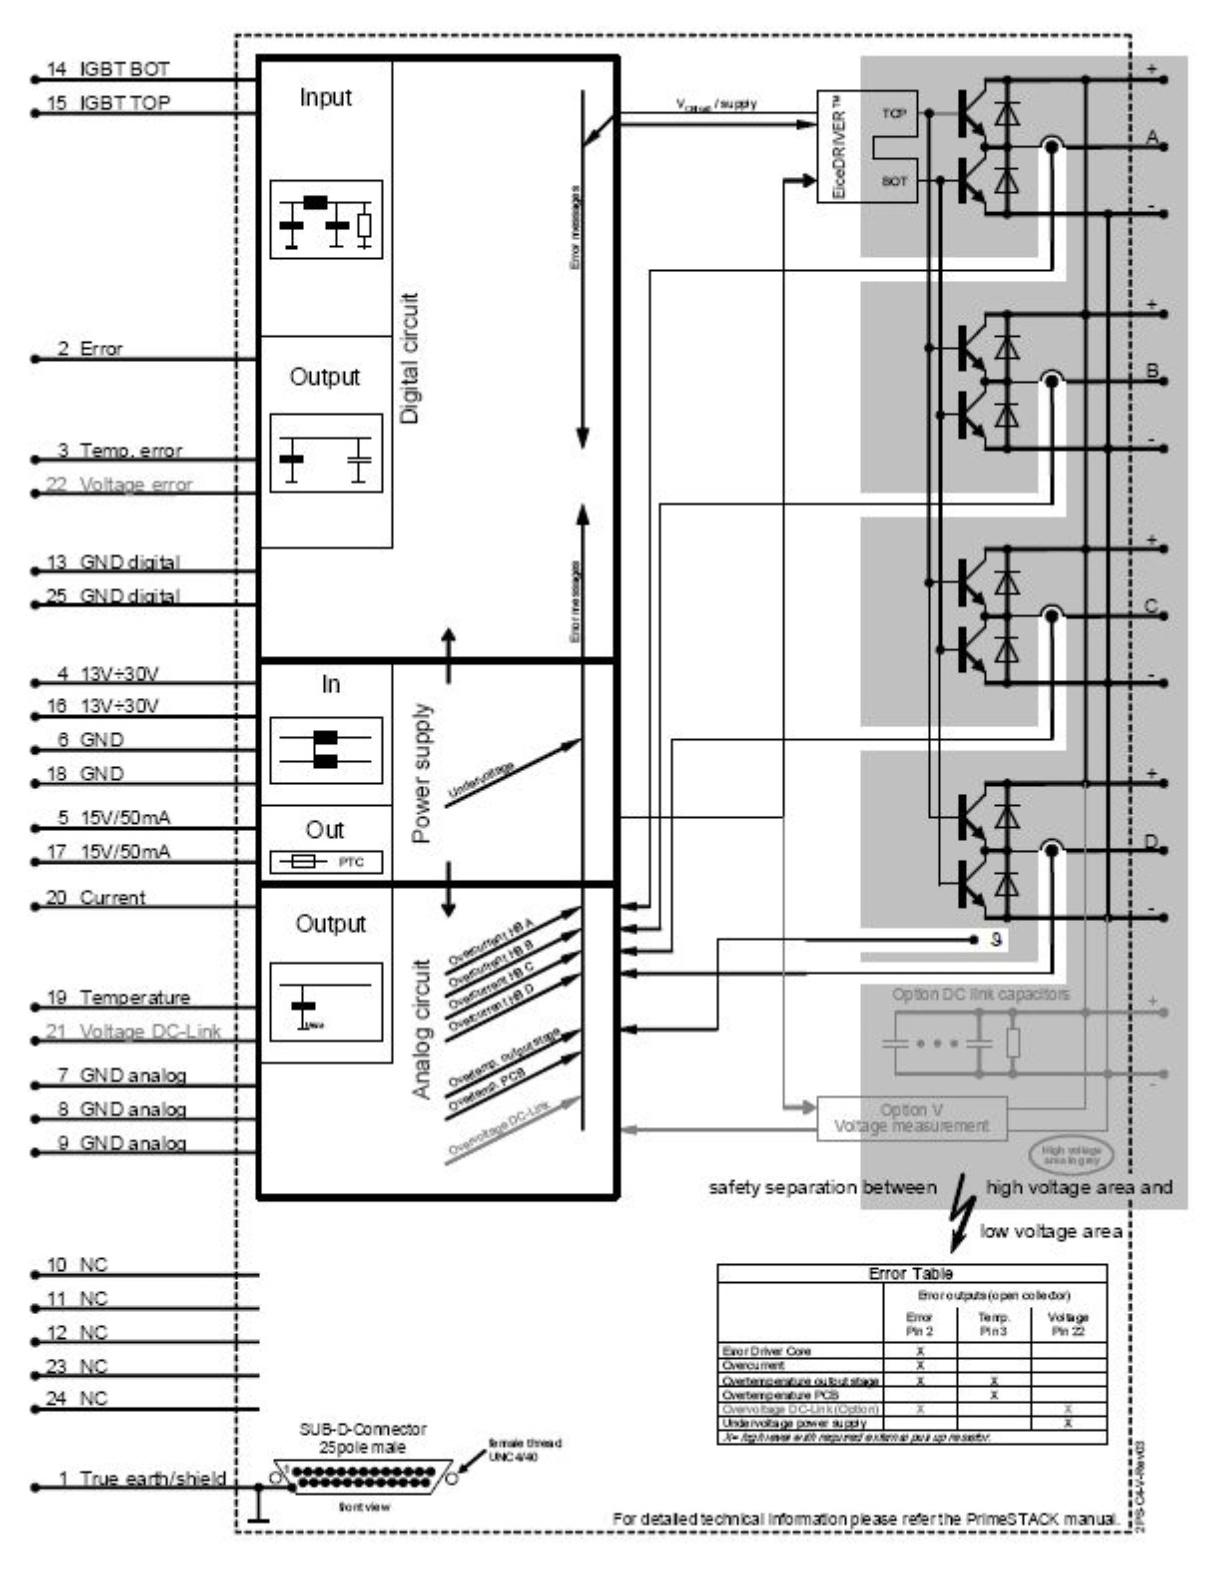 2ps12017e34w32132 Infineon Technologies Igbt Ups Circuit Diagram Diagrams Prevnext